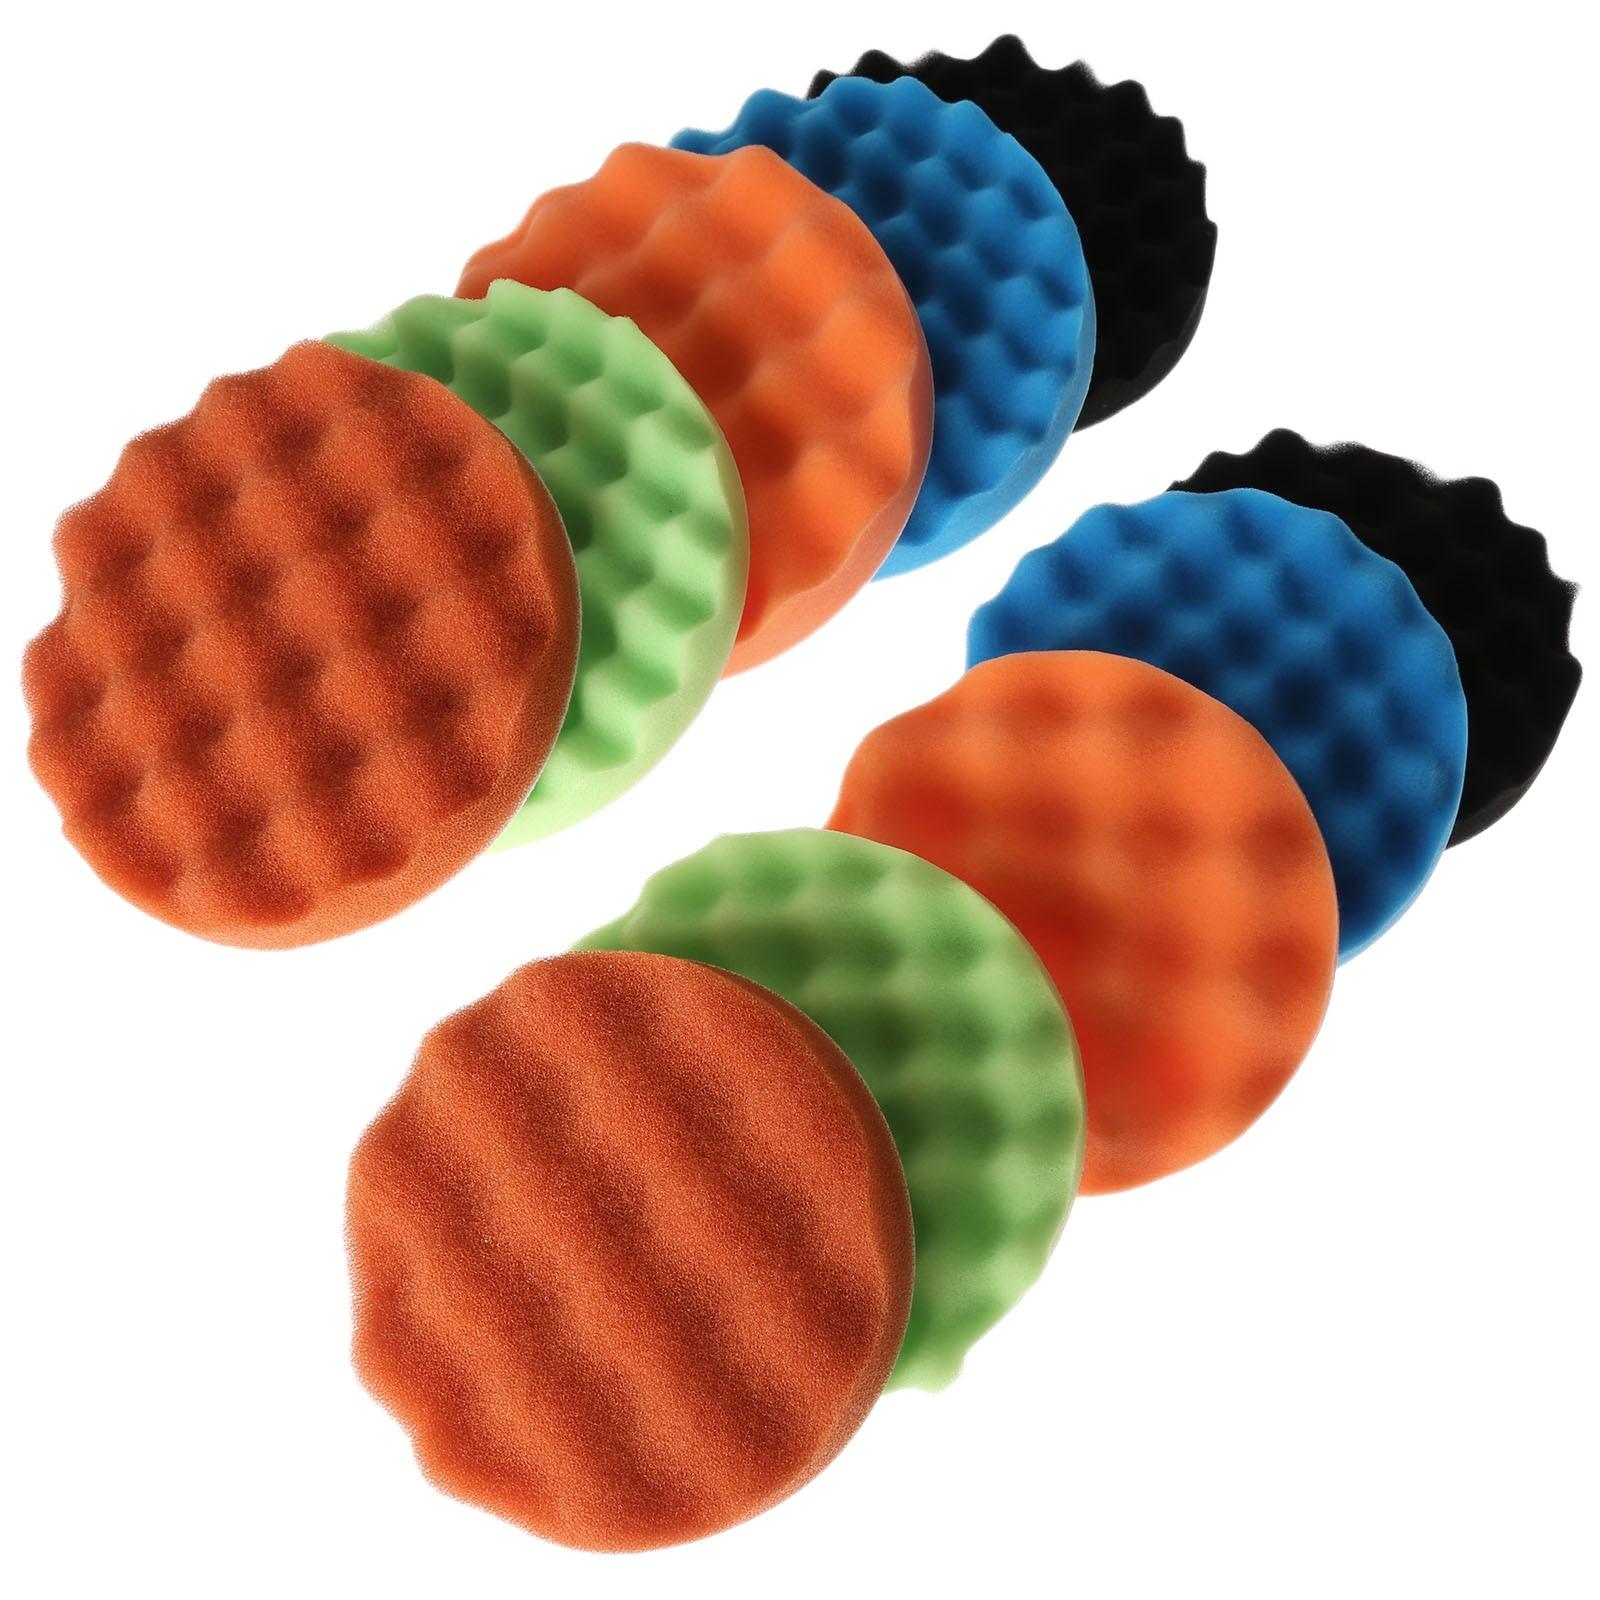 10mm Wool Felt Mounted Tips Ball Polishing Drills Strawberries Polishing Wheels Grinding Head 2 sets